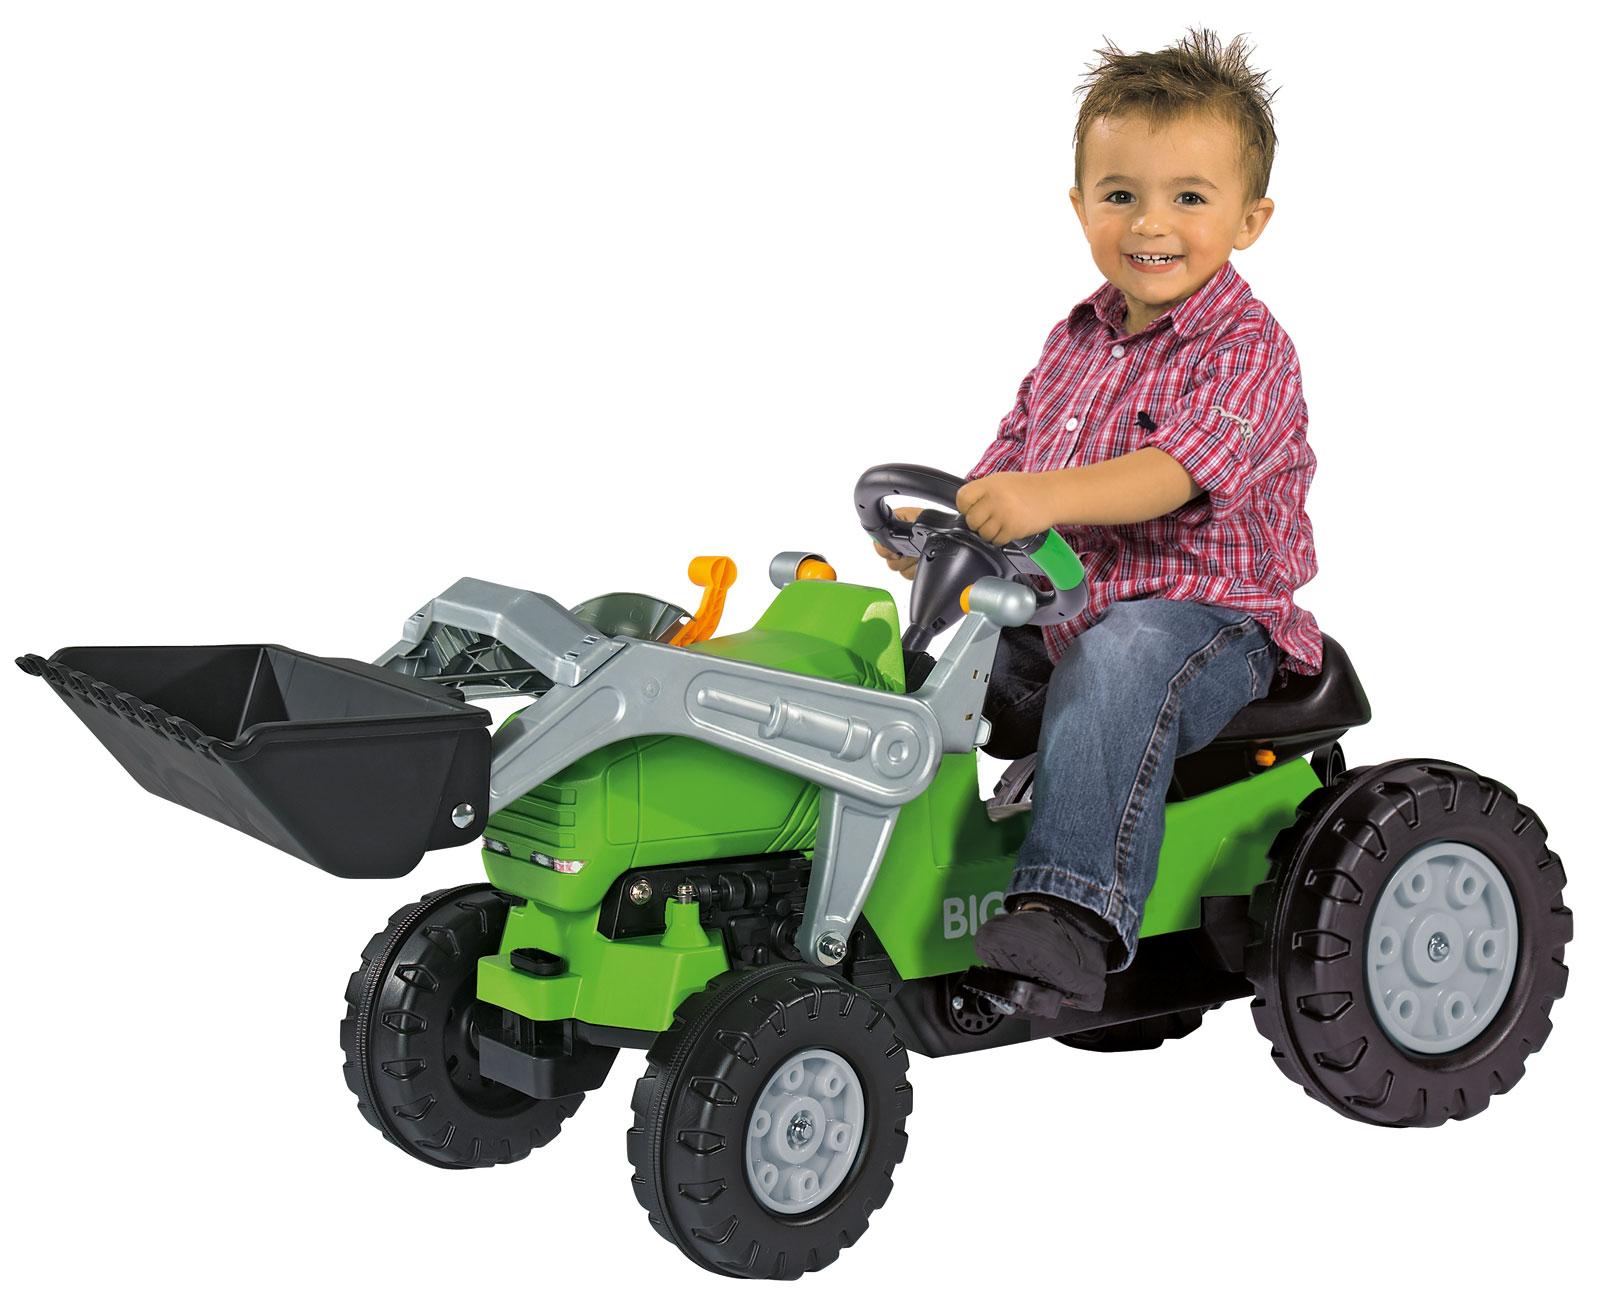 BIG Traktor Lenkrad Sound Wheel Bild 3